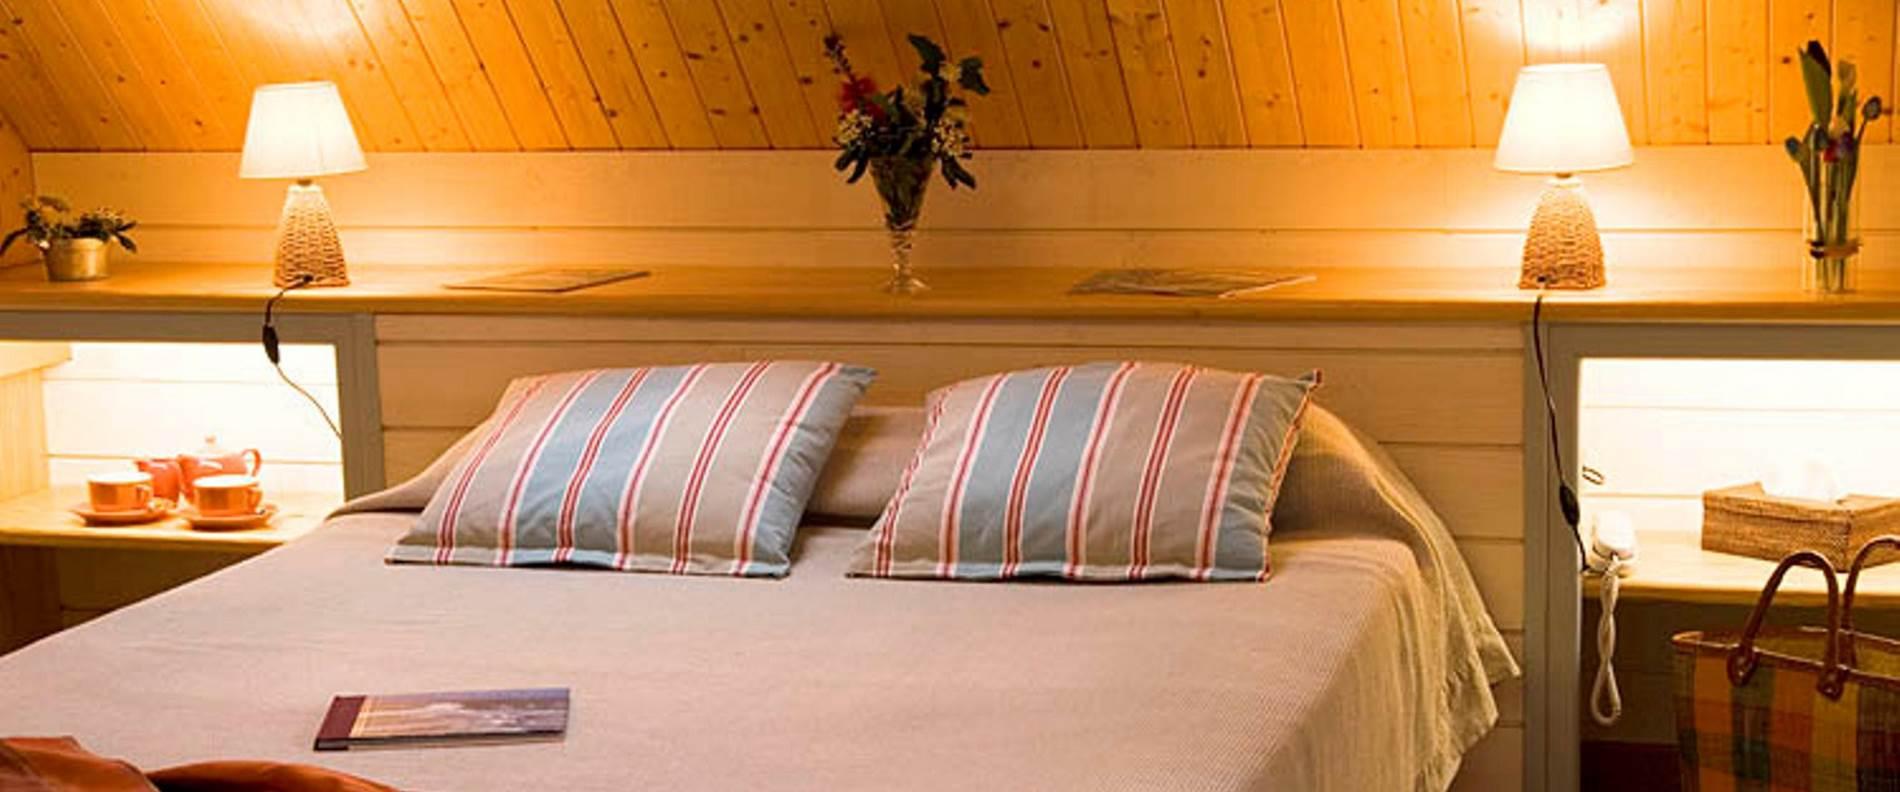 Hotel-Restaurant-La-Désirade-Bangor-Morbihan-Bretagne-Sud © Hotel-Restaurant-La-Désirade-Bangor